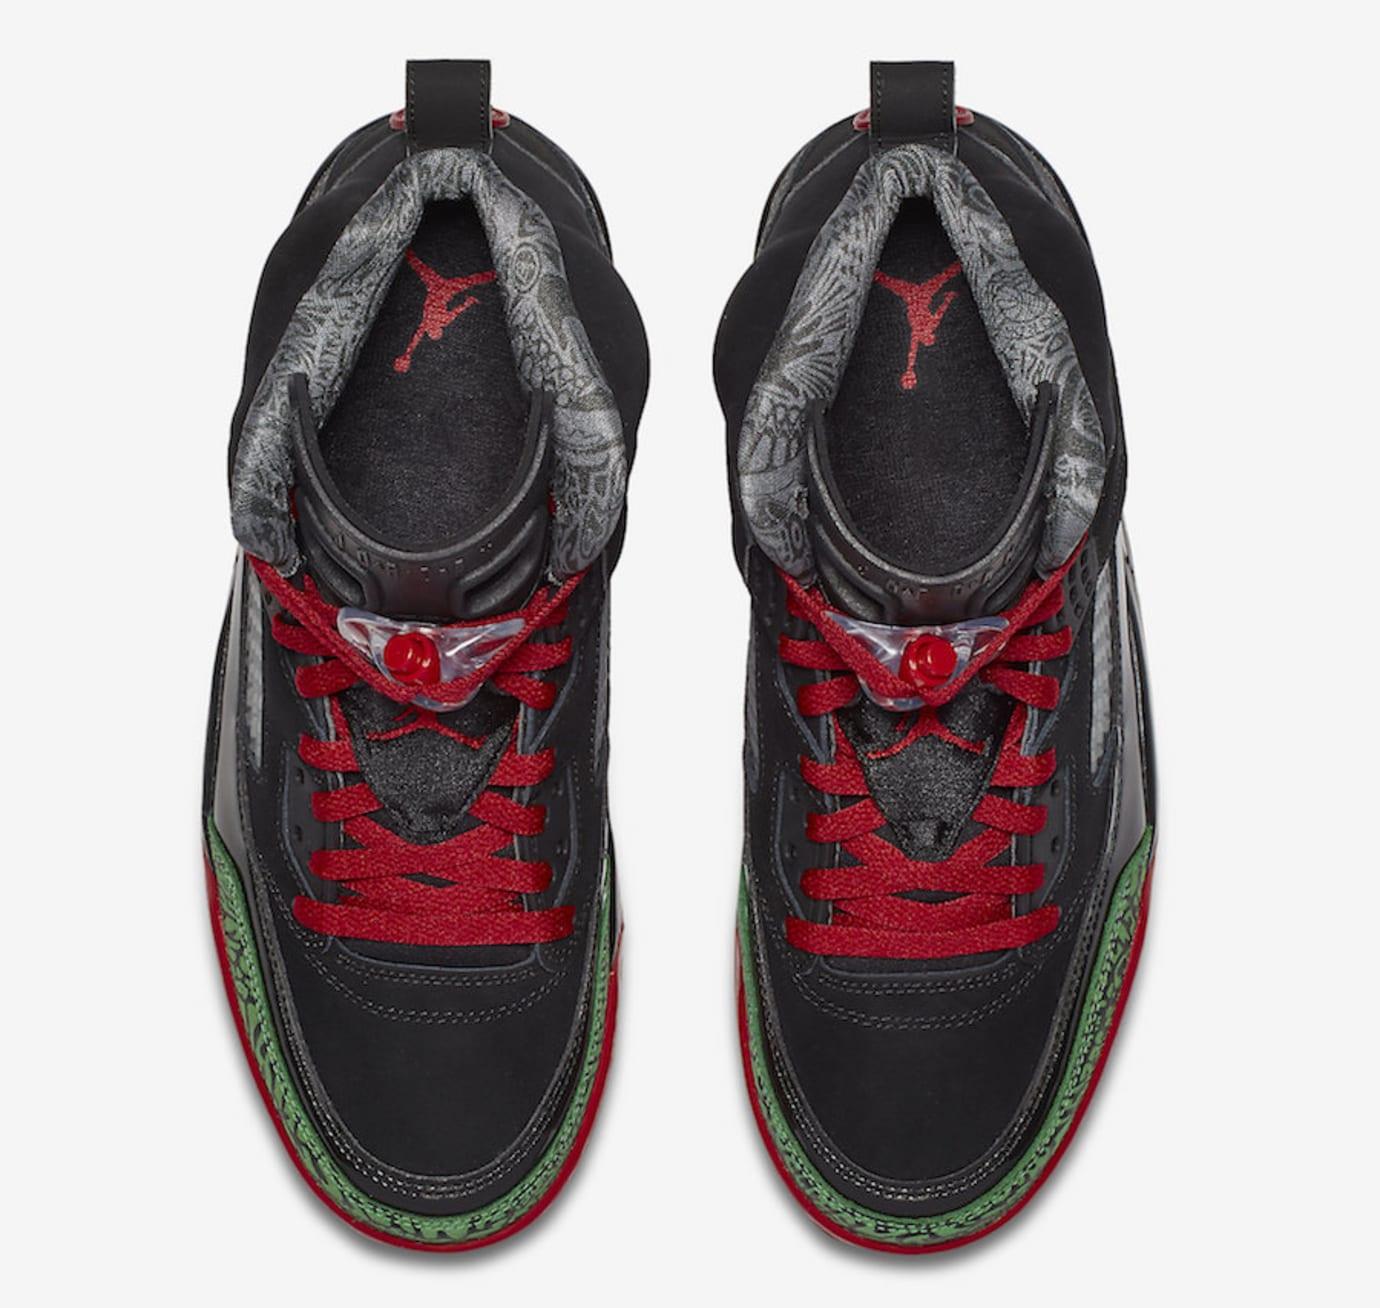 Air Jordan Spizike OG 315371-026 (Top)